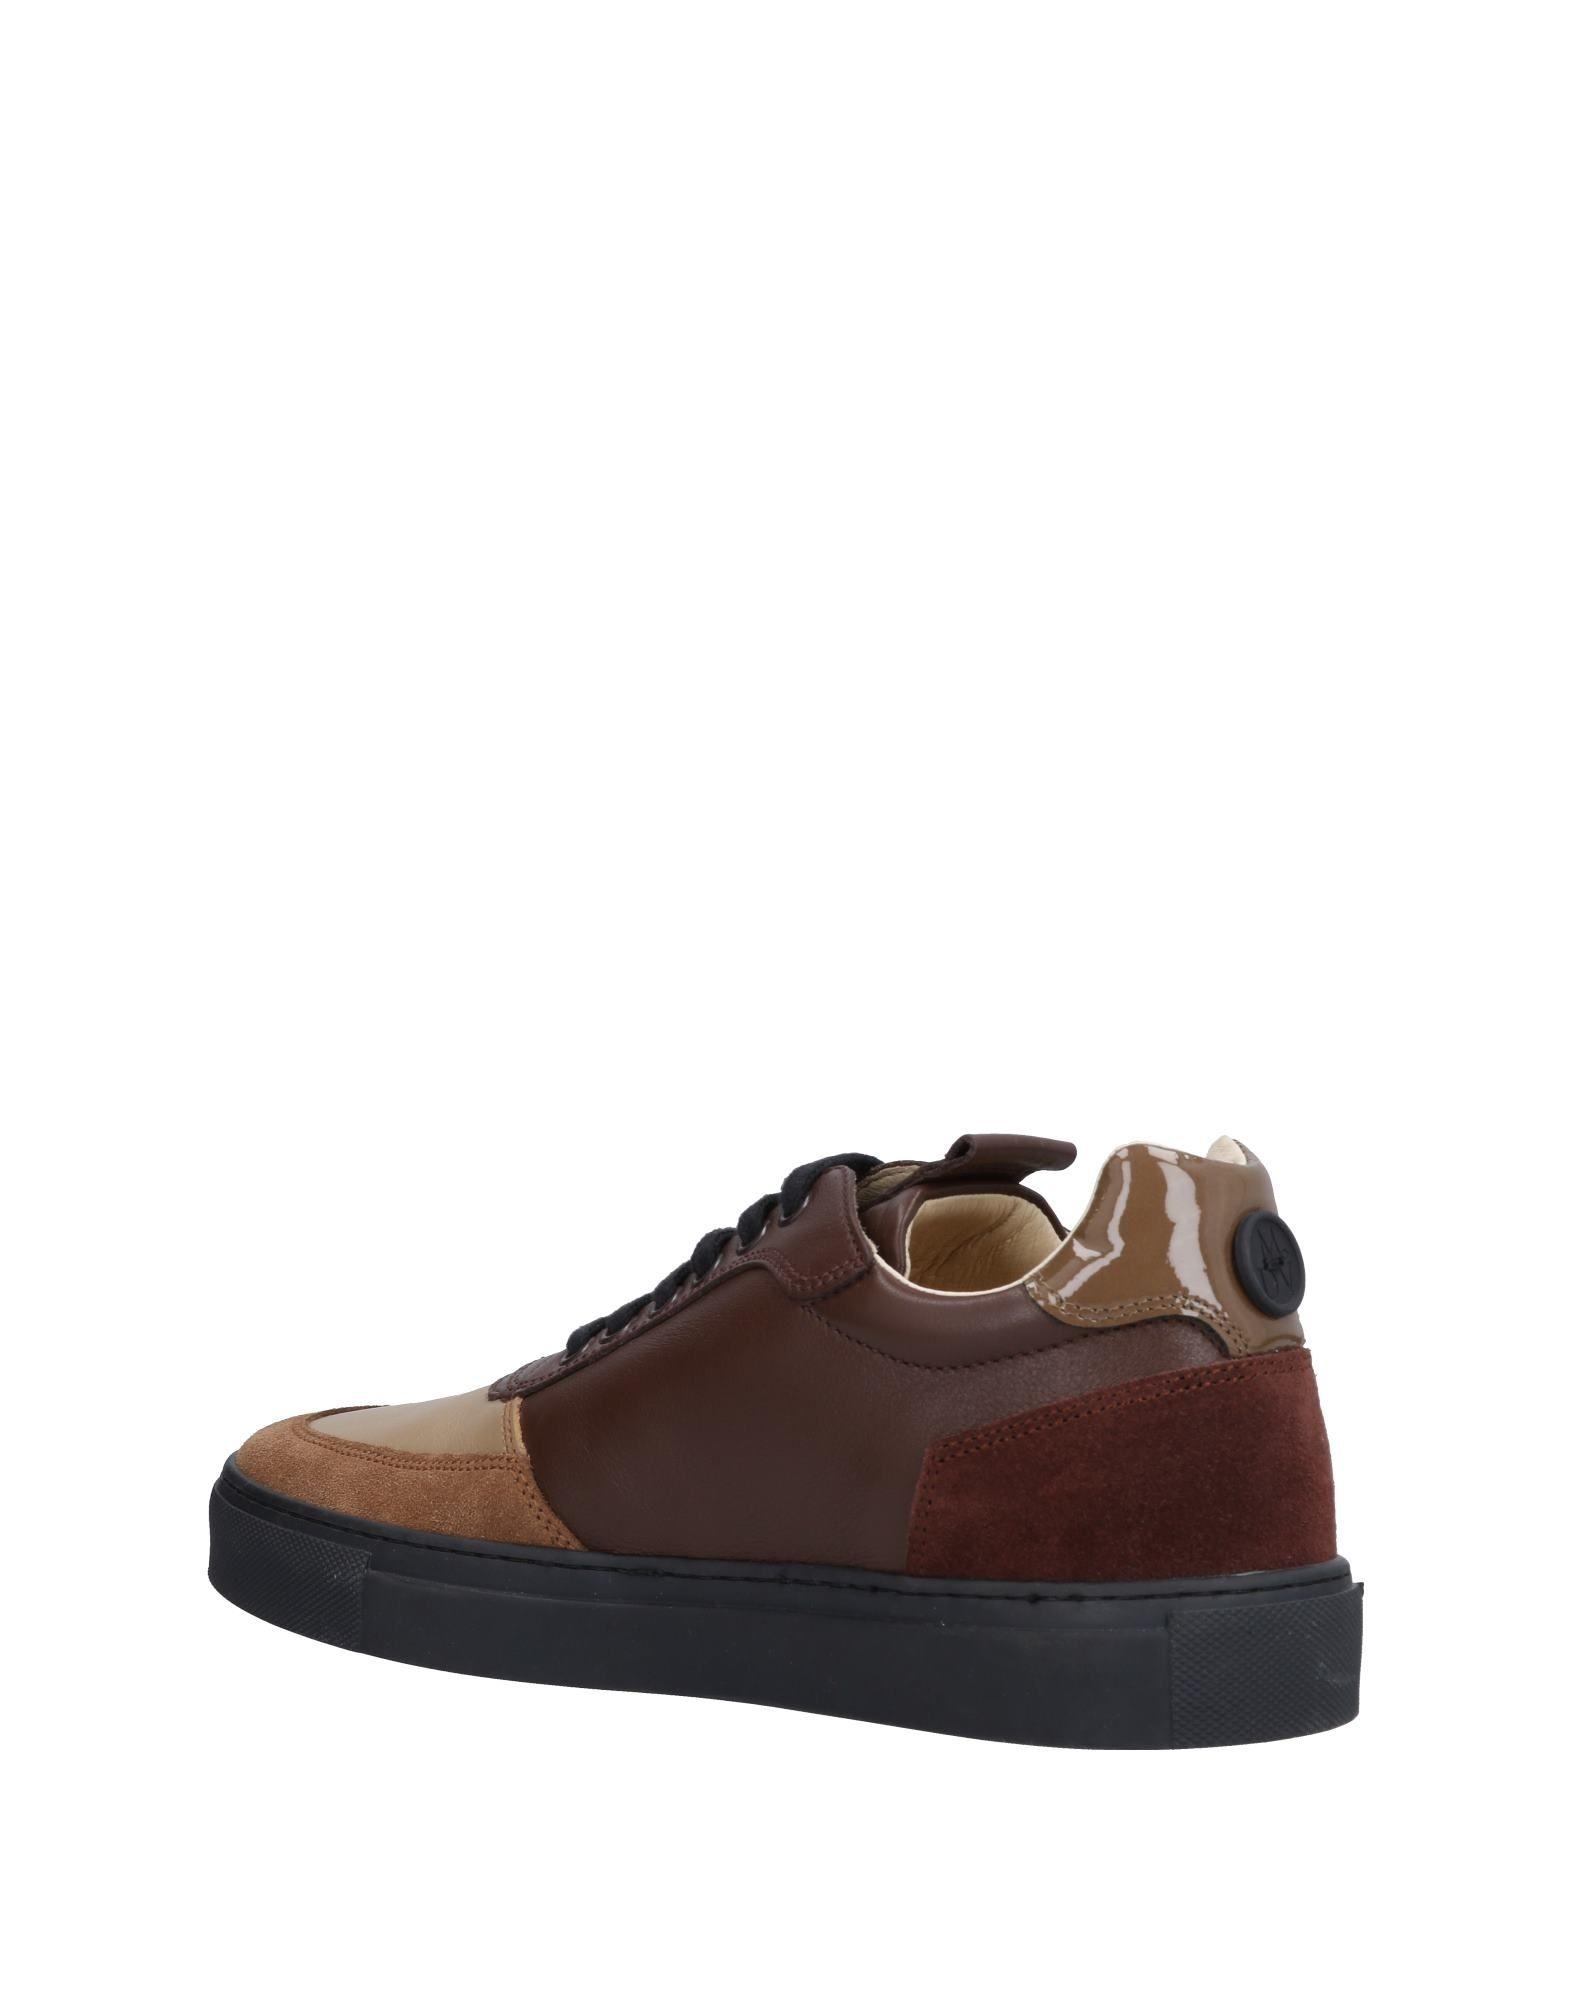 Vaio Mariano Di Vaio  Sneakers Herren  11499887SE 0be862